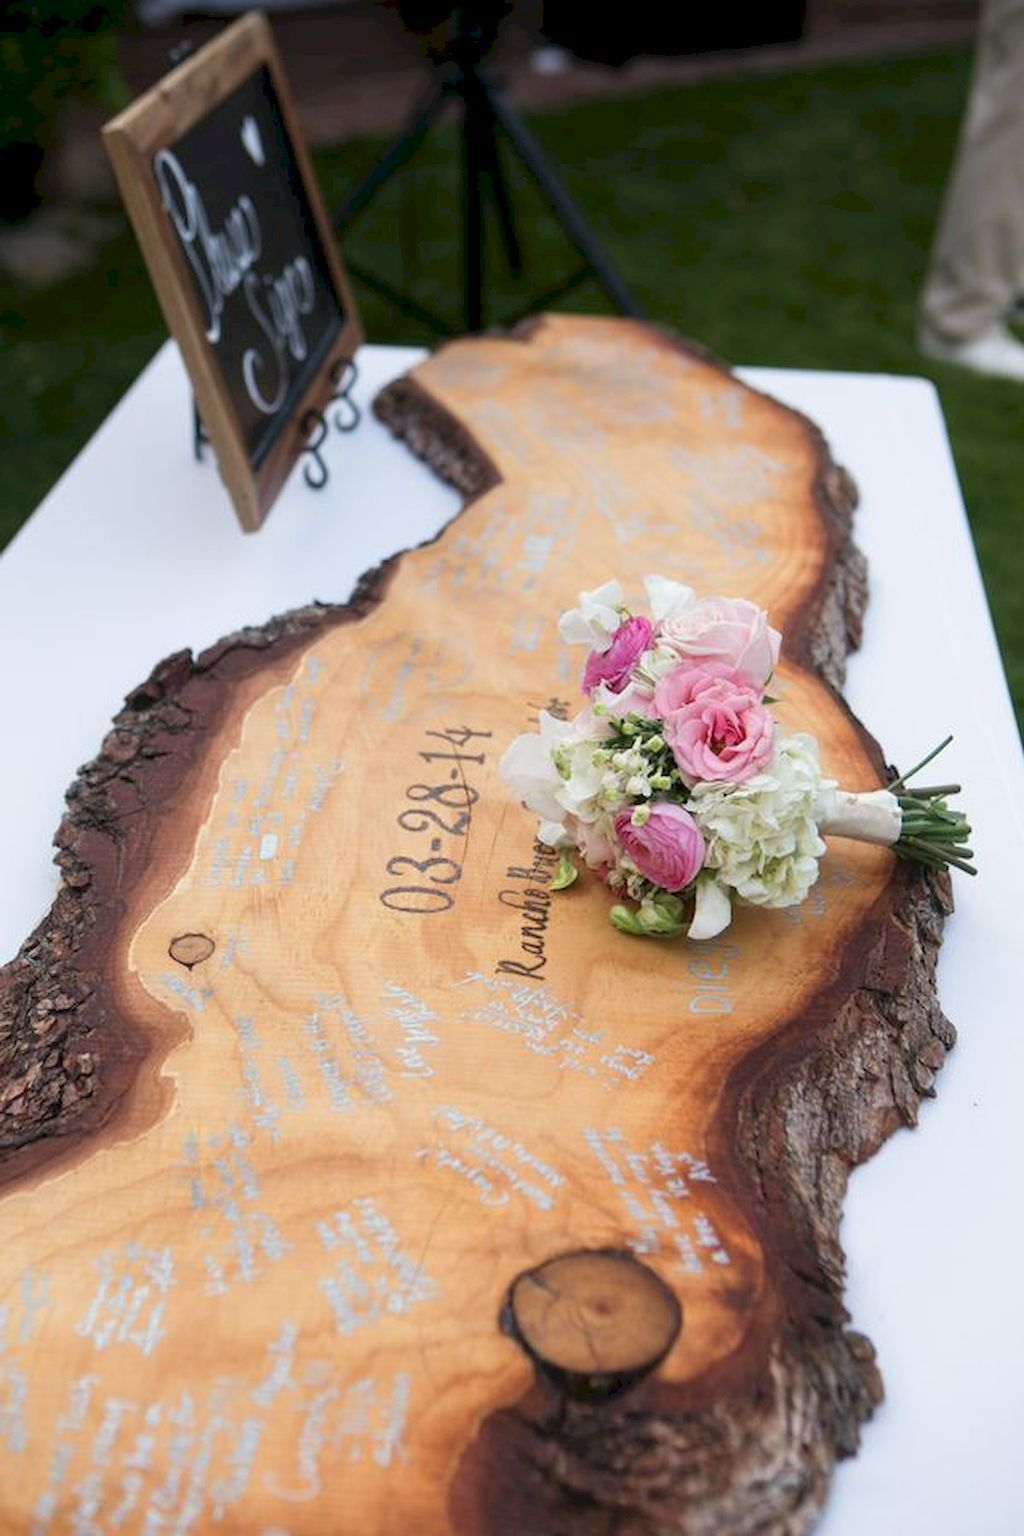 Unique Rustic Country Wedding Guest Book Ideas Weddings Weddingideas Weddinguestbooks Weddinginspiration